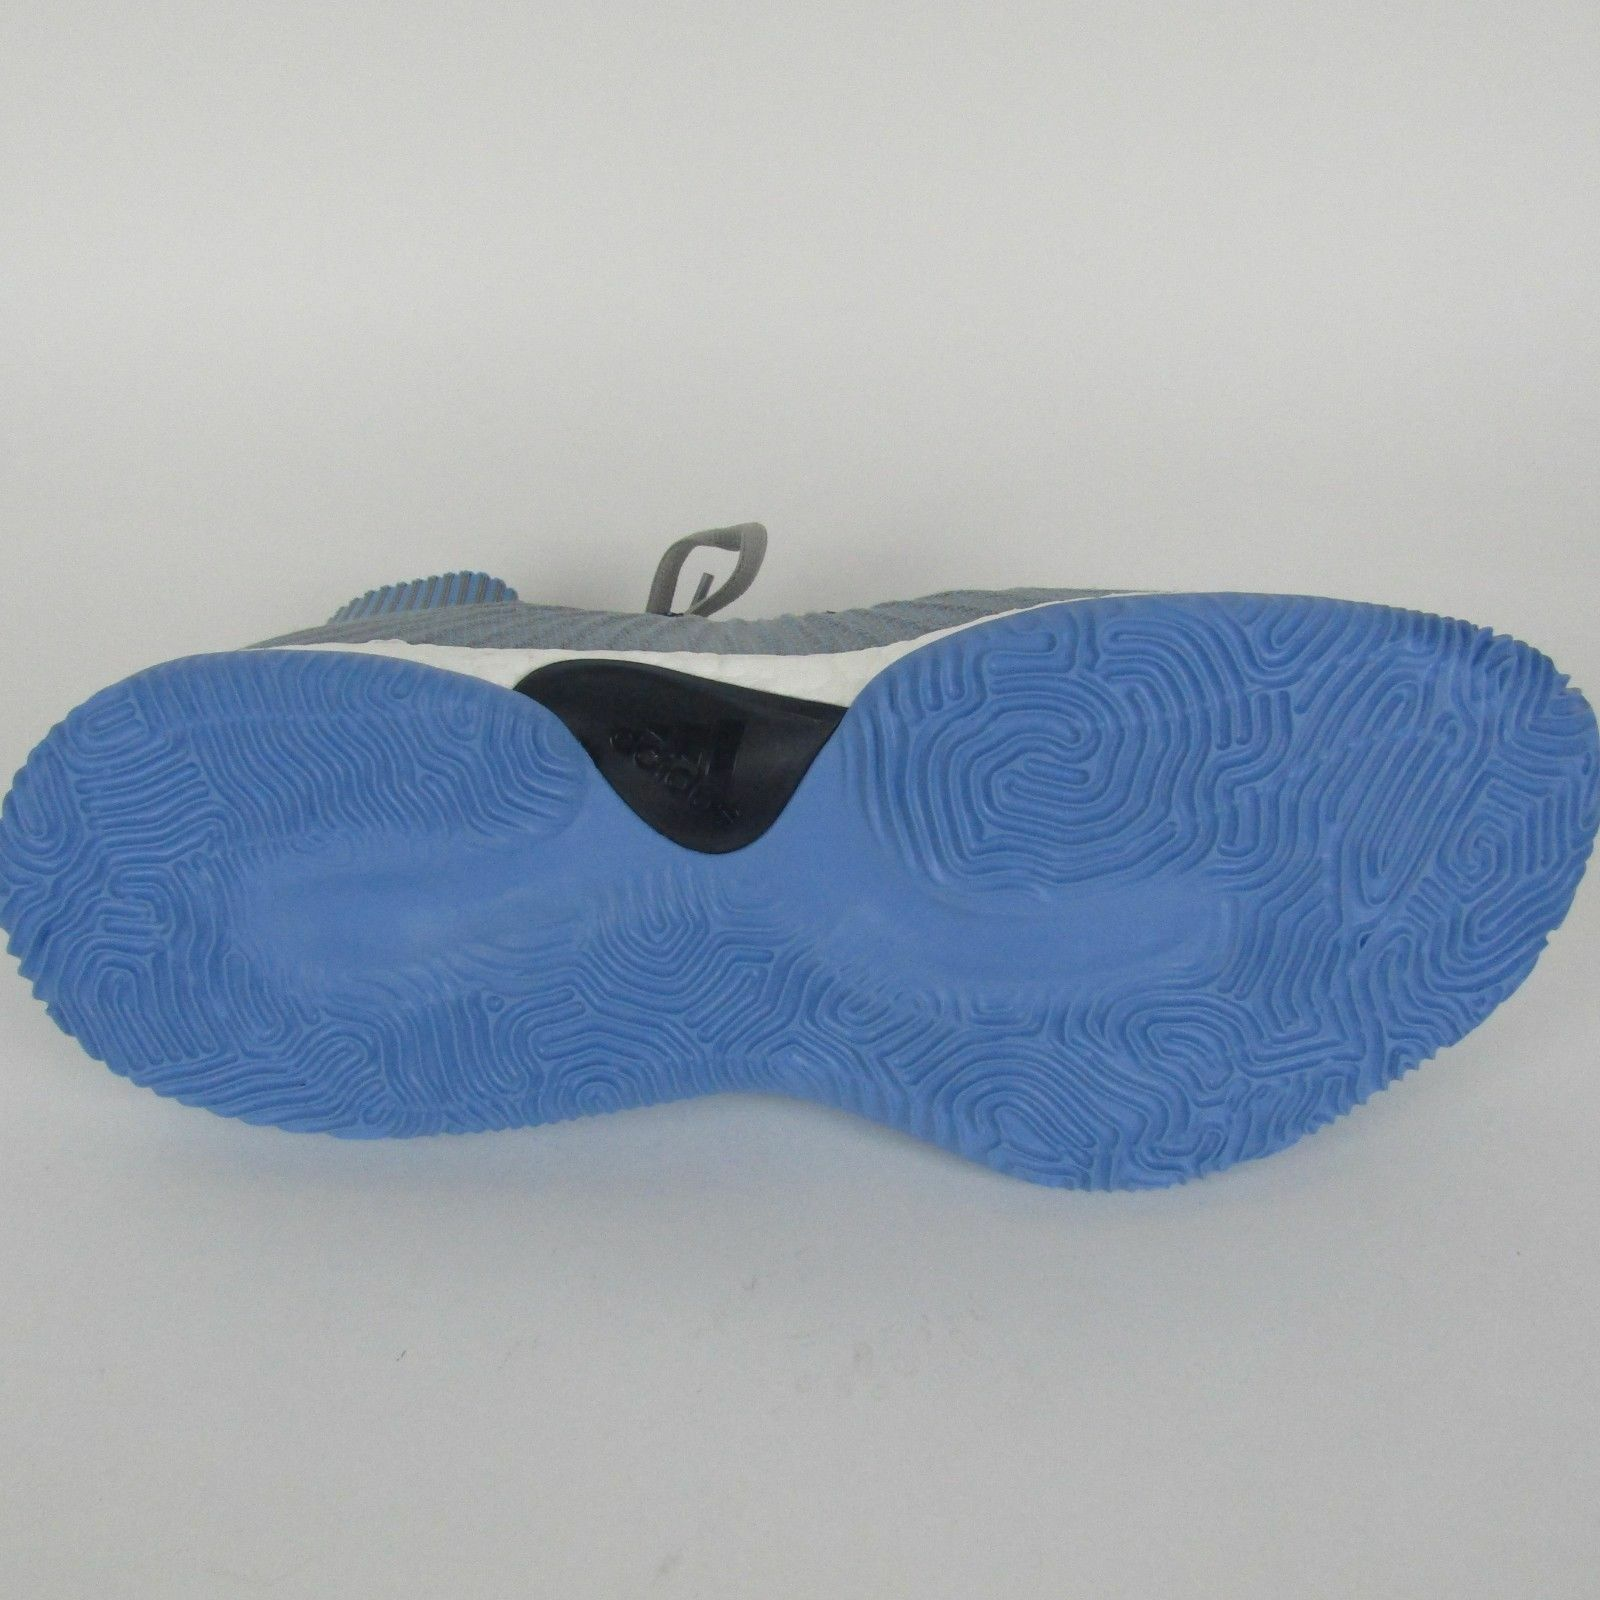 Adidas Crazy Esplosiva Primeknit Kenneth Sonia Ferrari Pe Pepite Nets AC8724 image 7